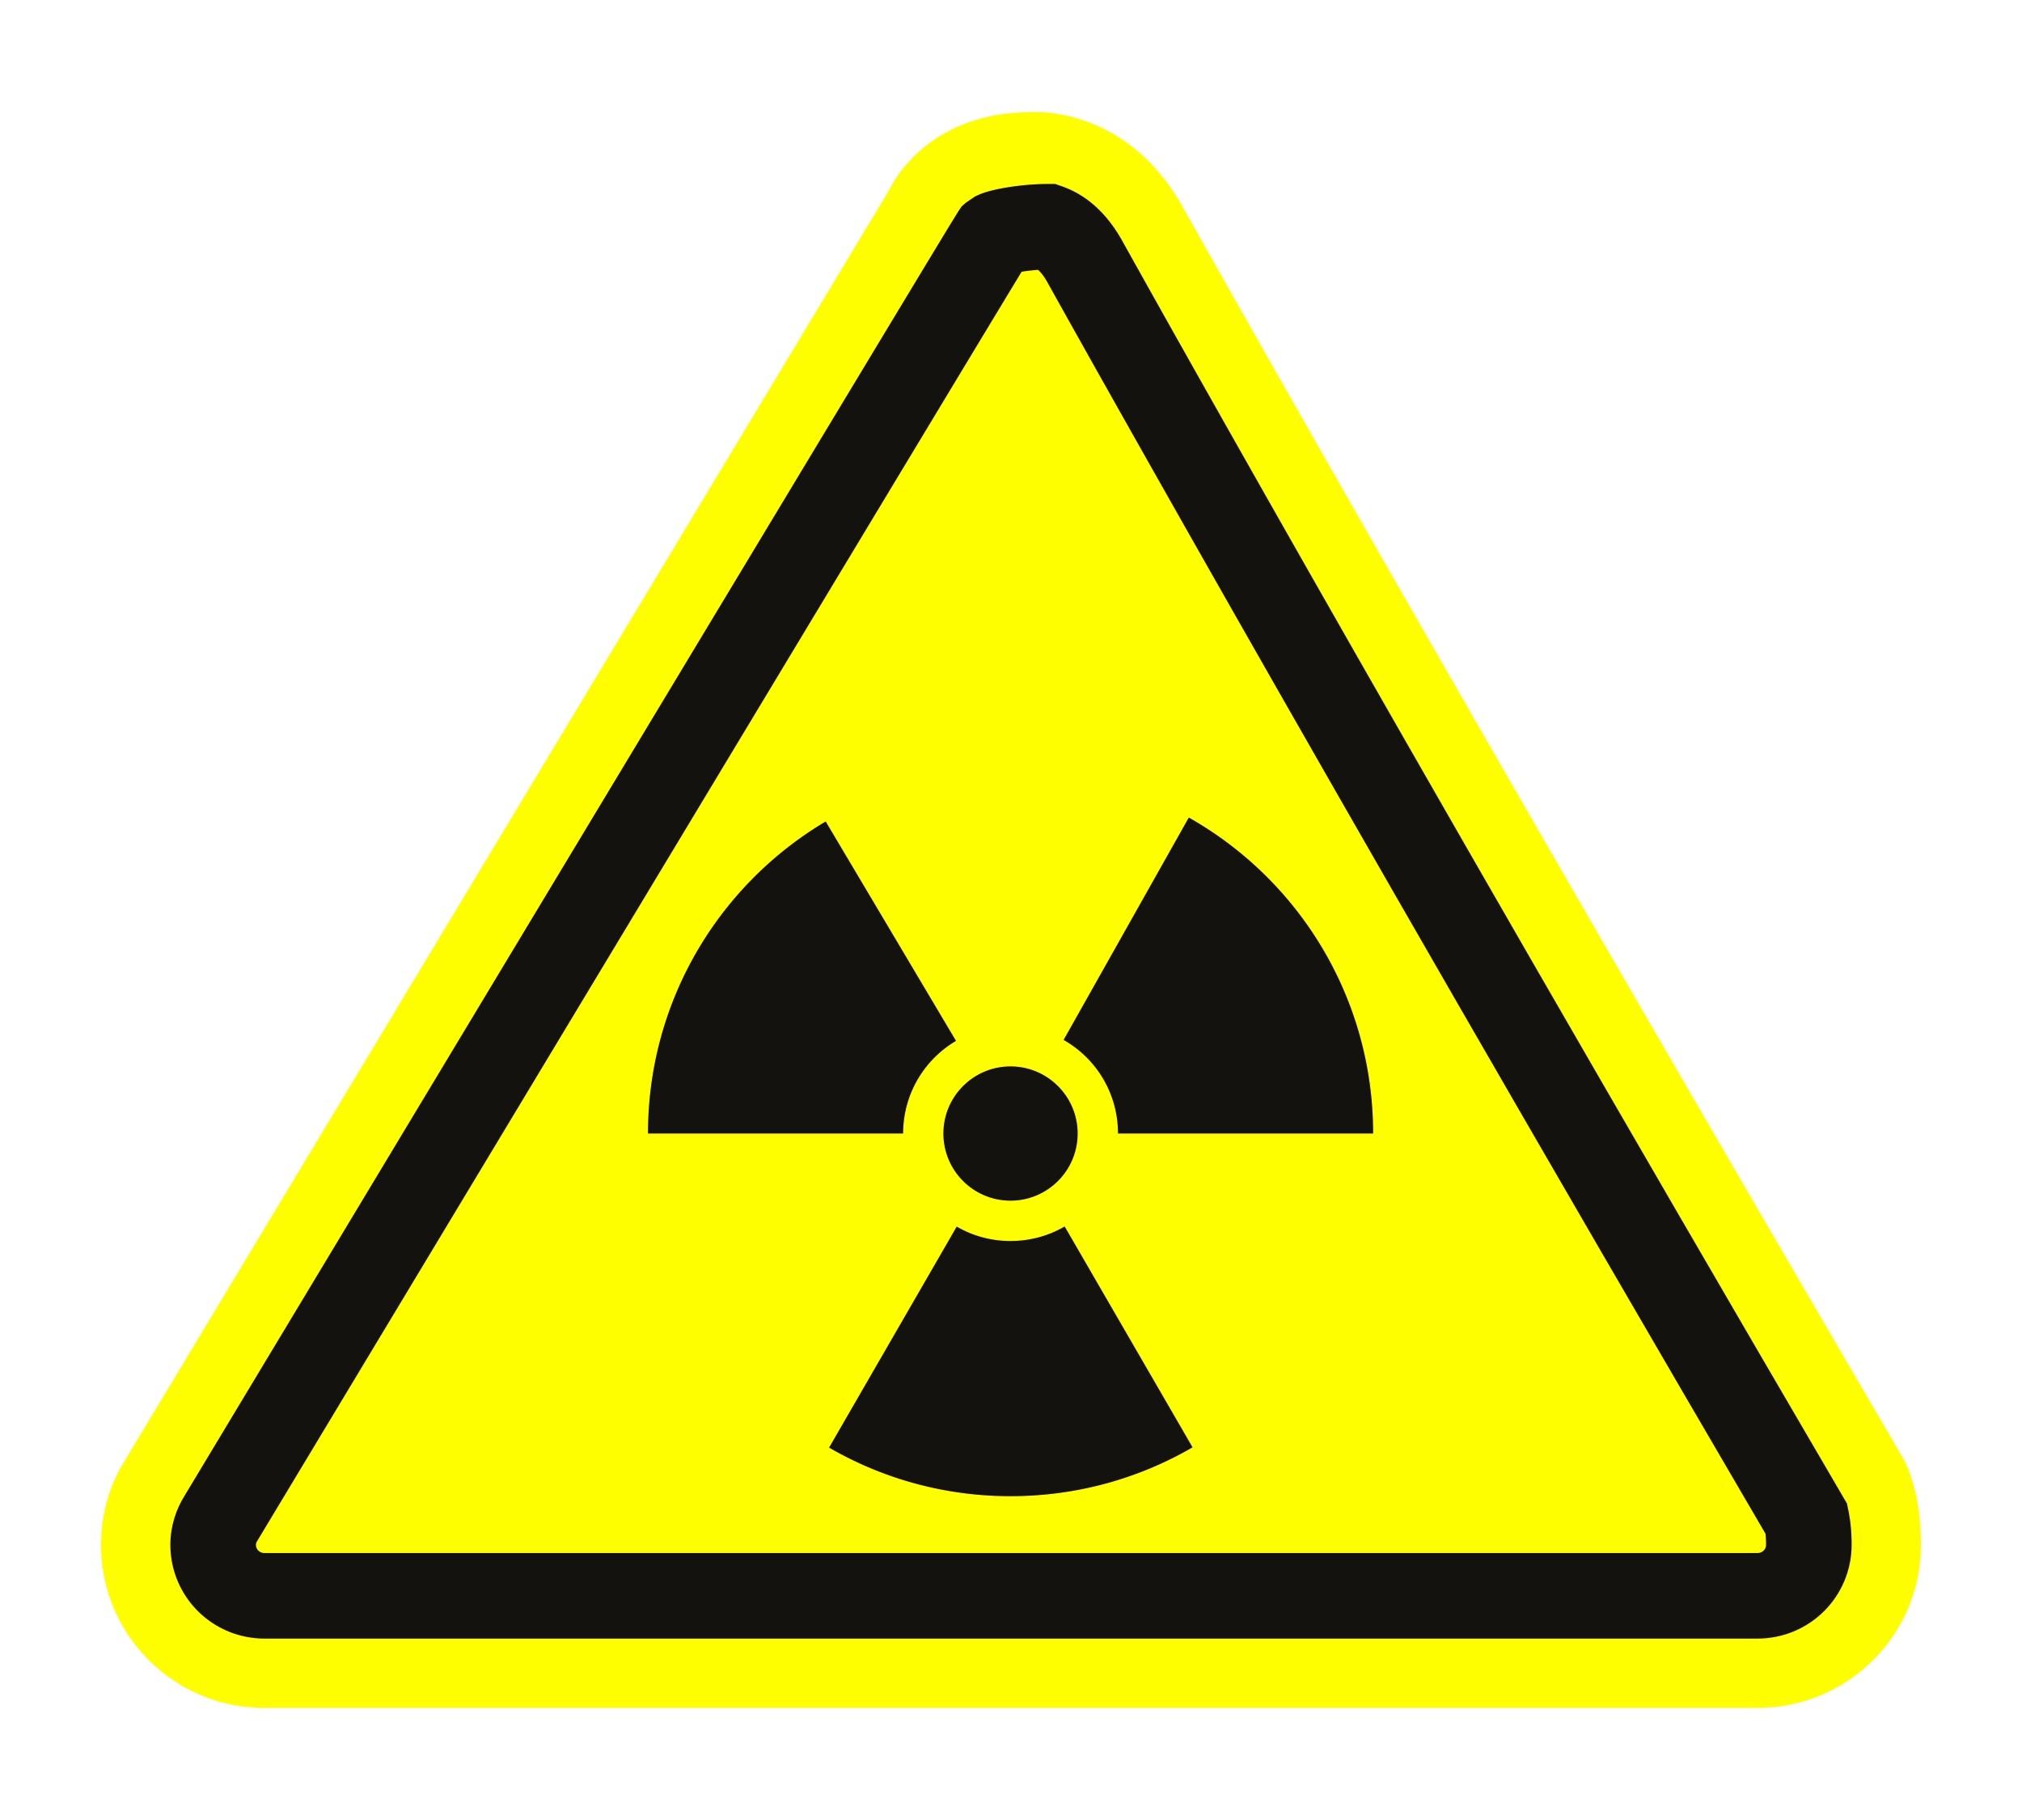 Autocollant Radioactivité triangulaire 70 x 80 mm – Bild 1